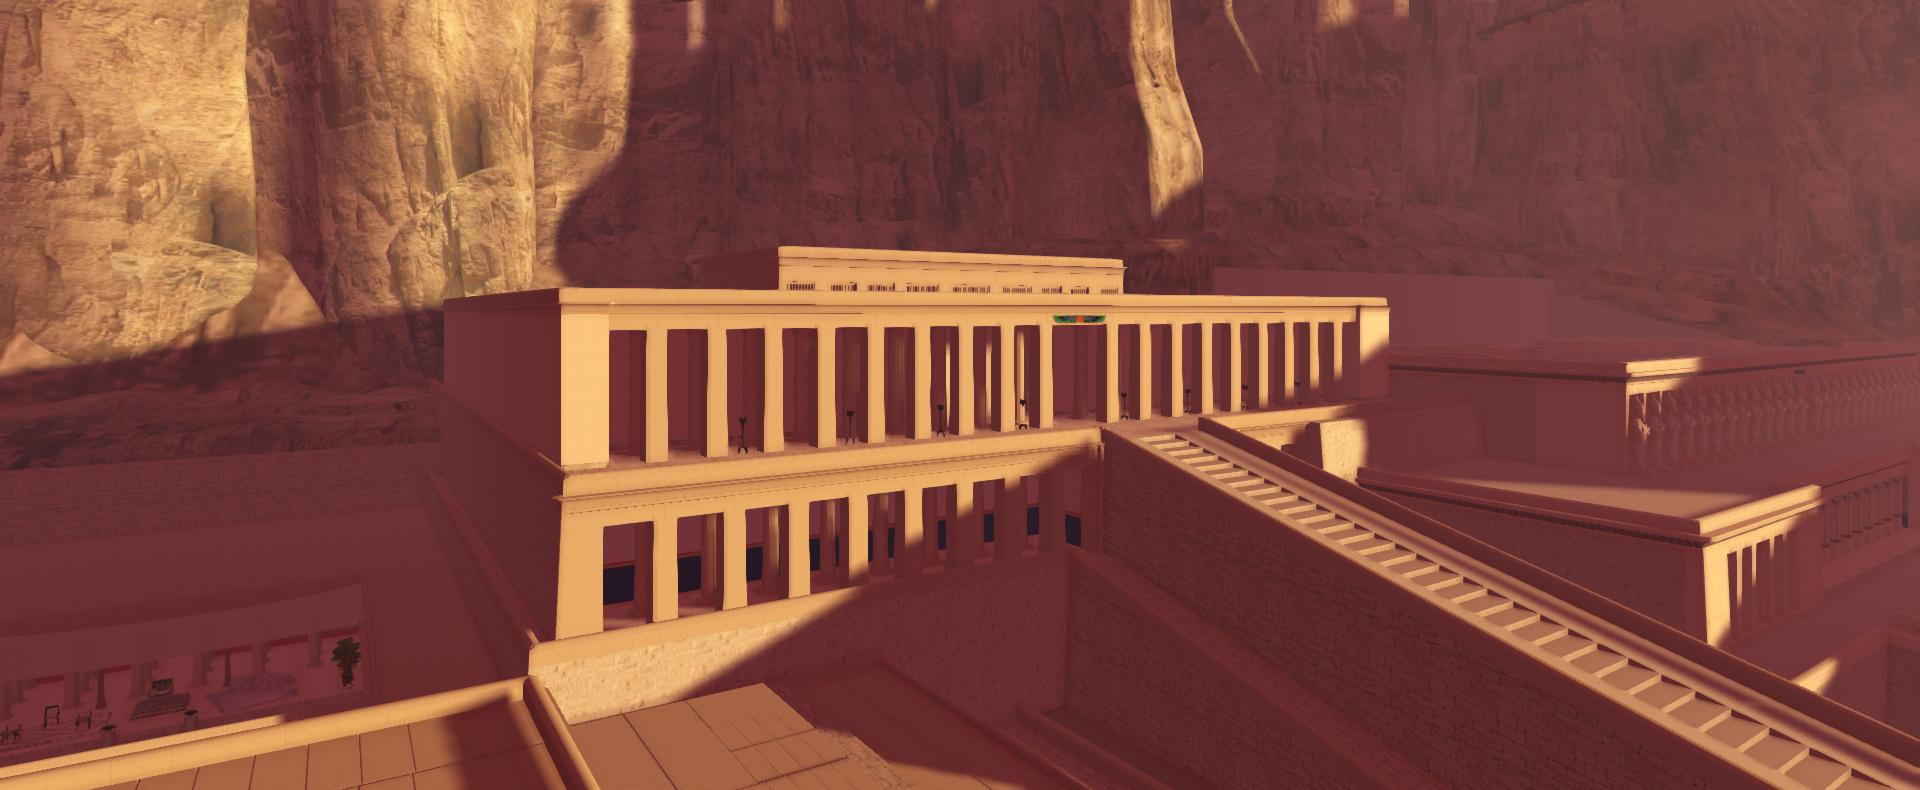 The Mortuary Temple of Thutmose III